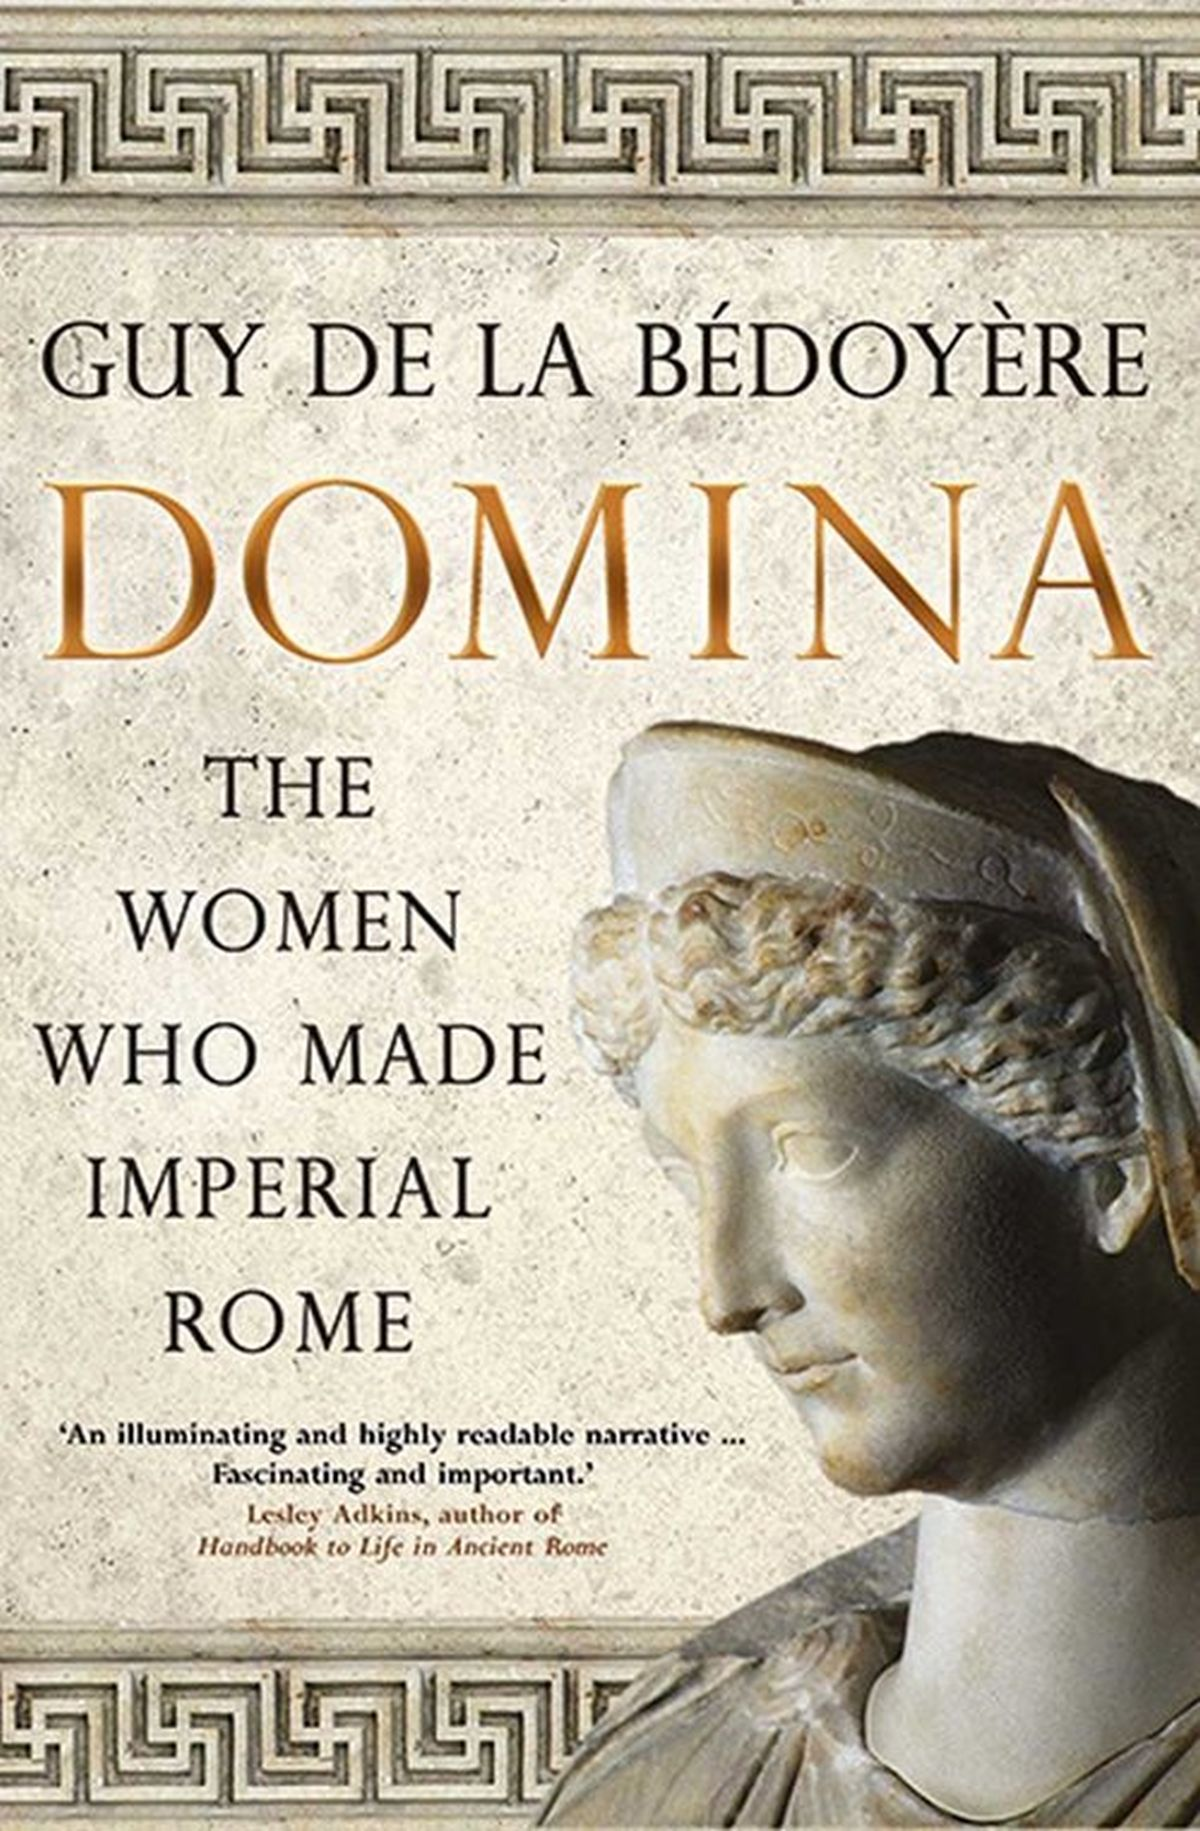 Guy de la Bedoyere, Domina. The Women Who Made Imperial Rome